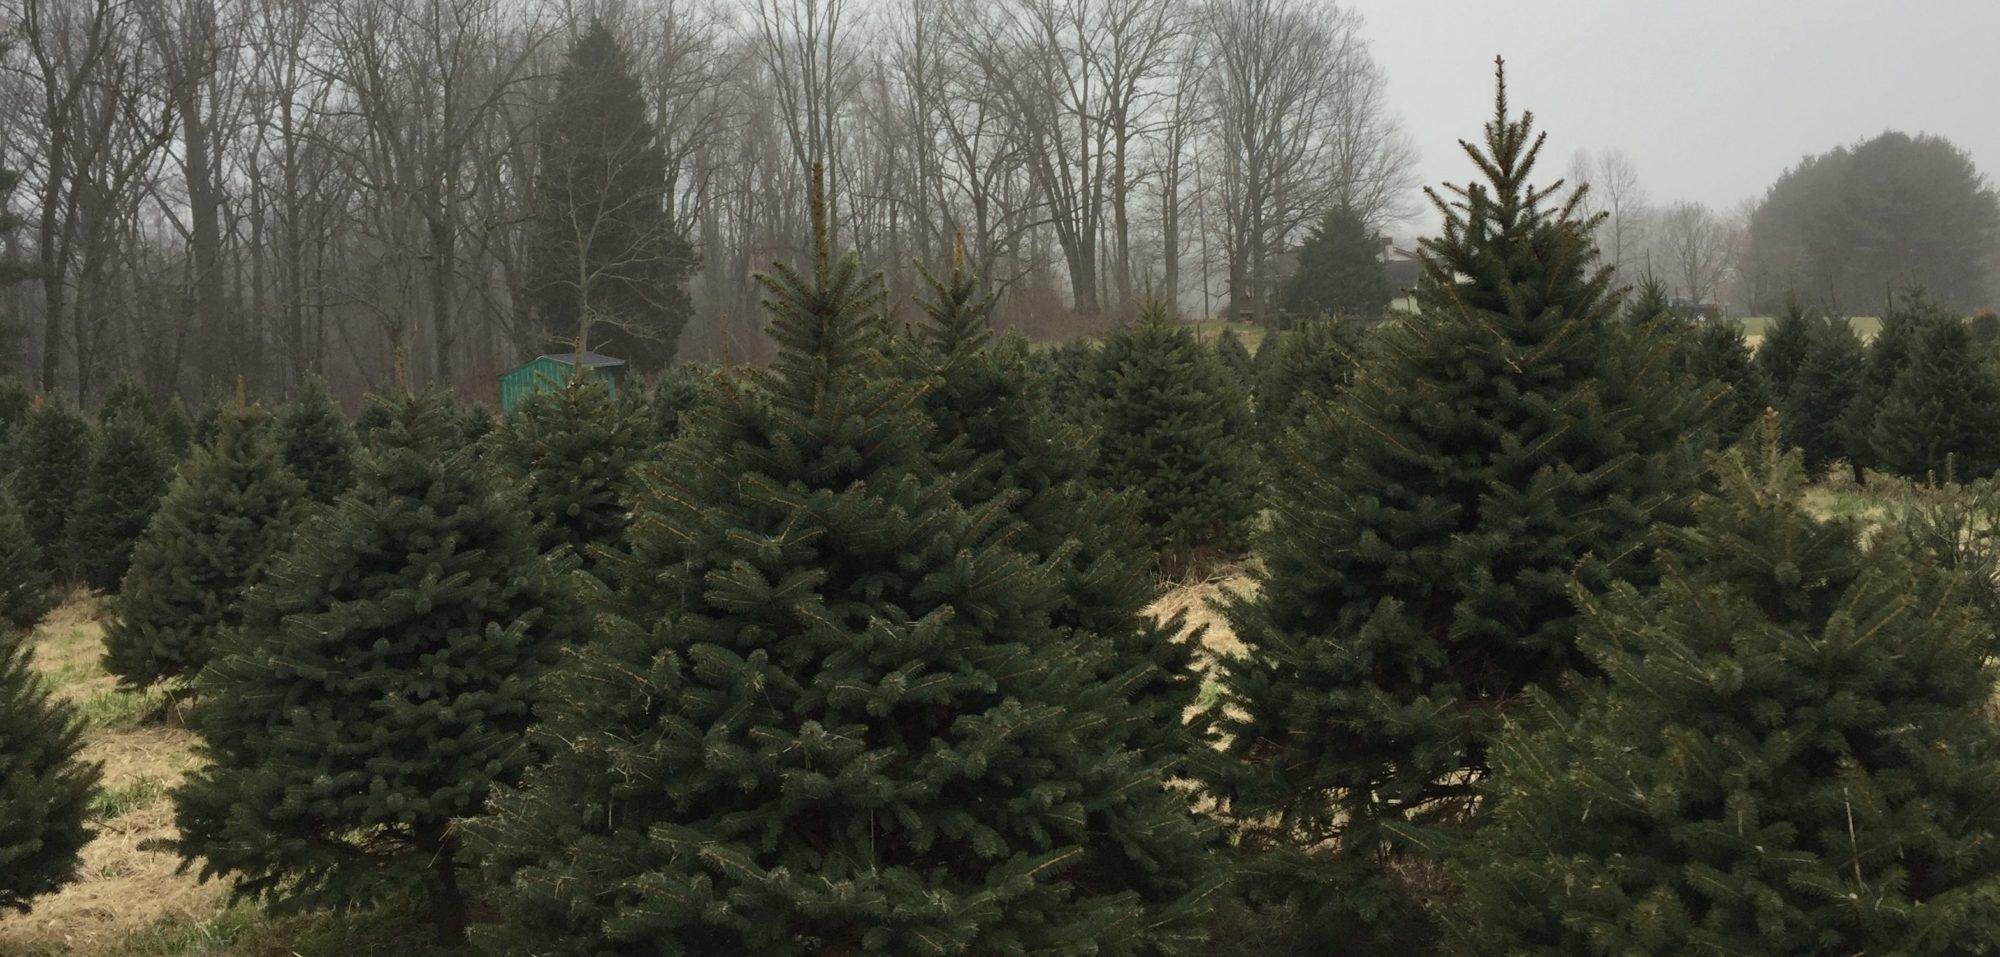 Hilltop Tree Farm